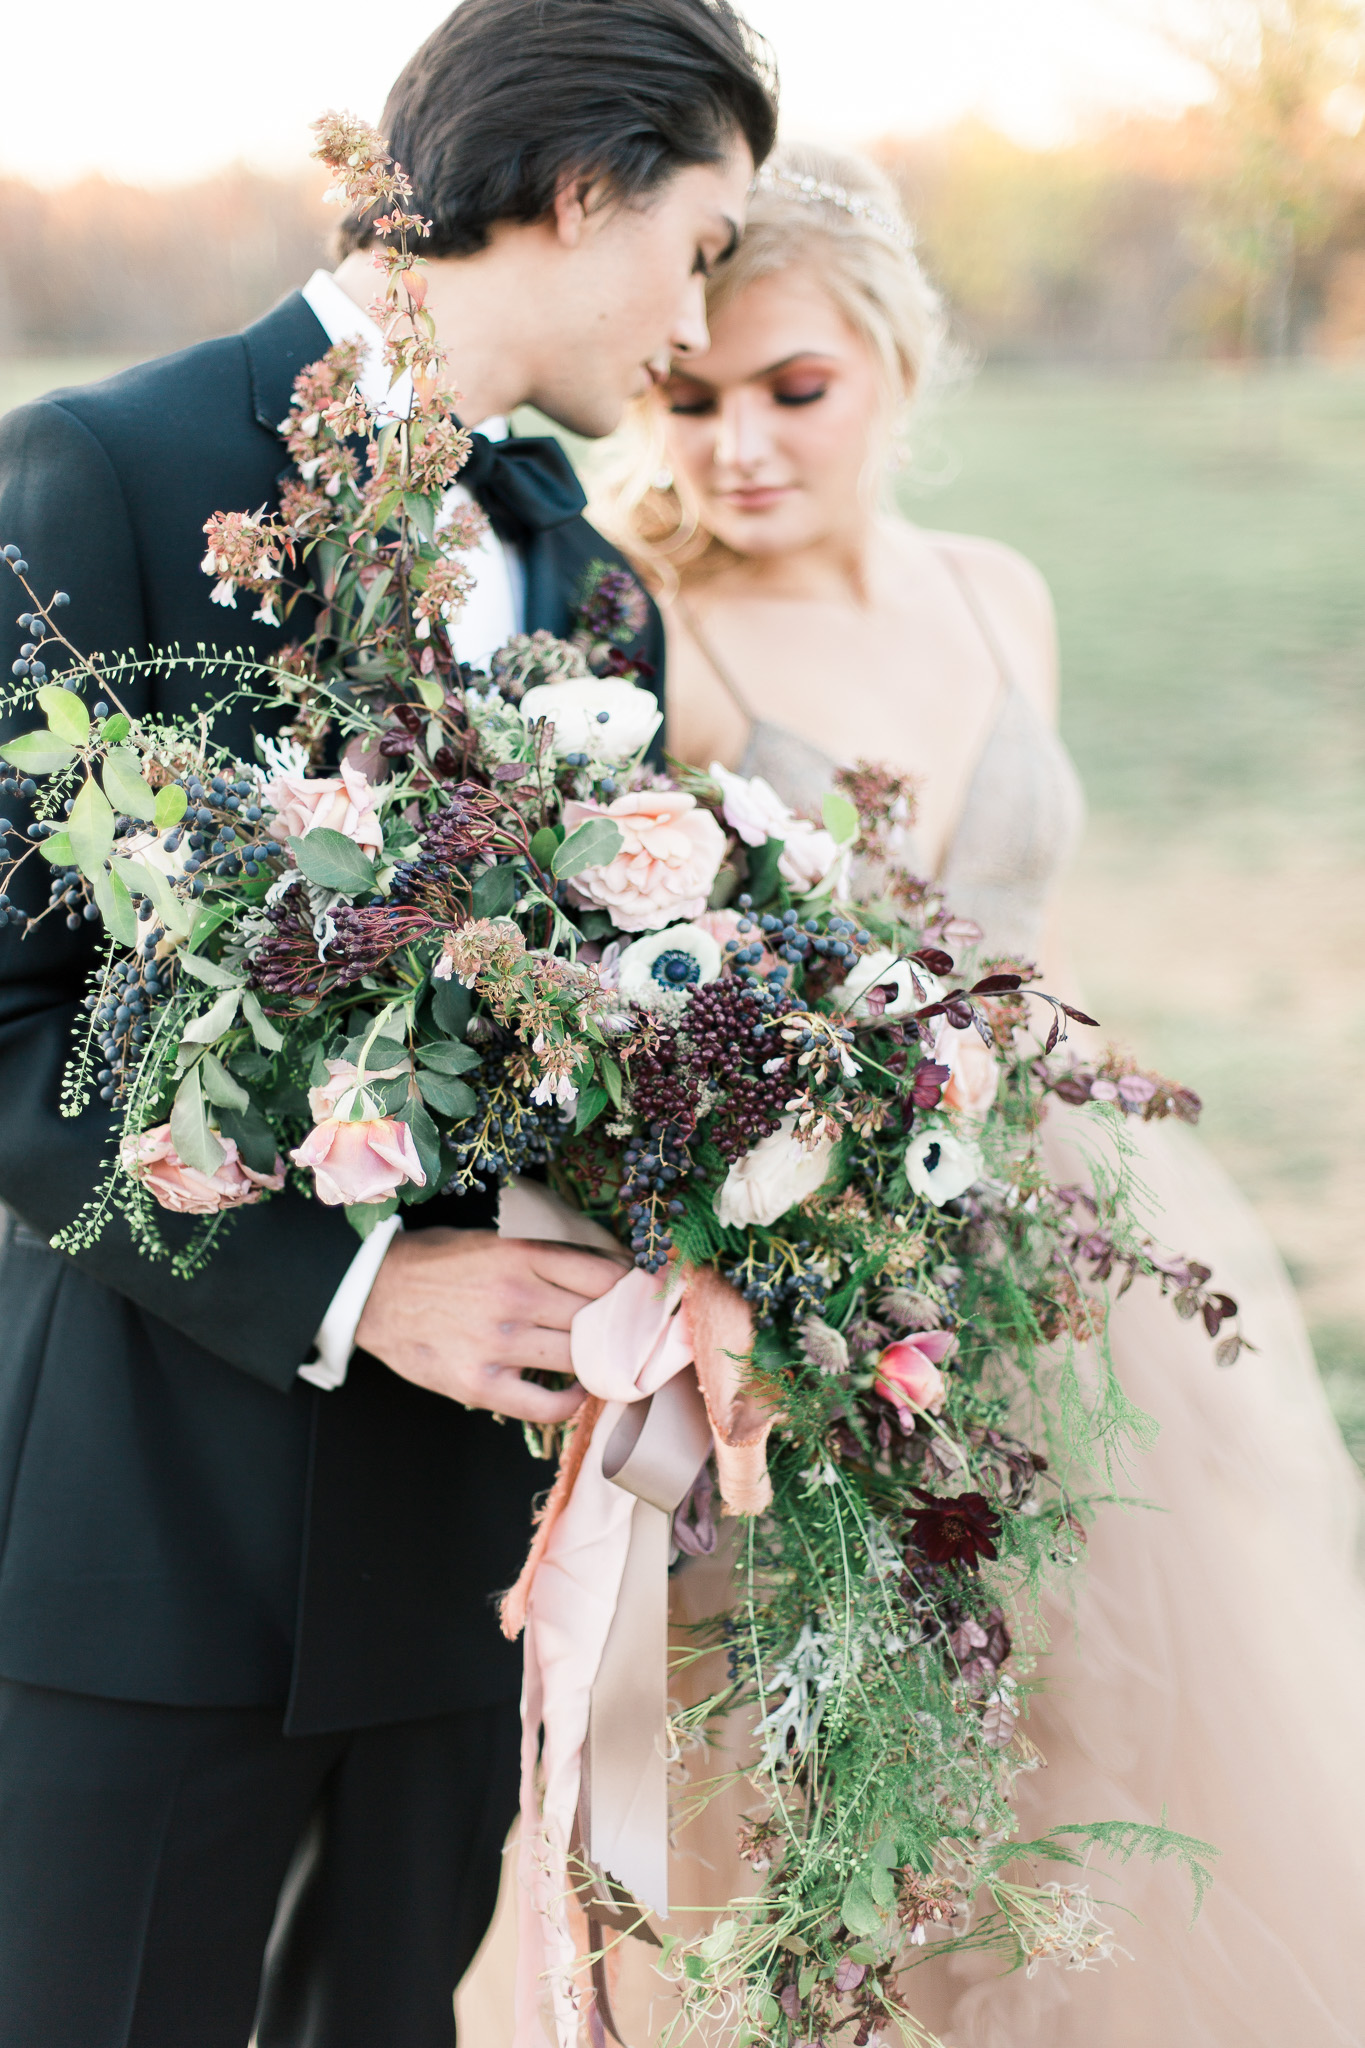 holly-chapple-flowers-blush-wedding-bouquet